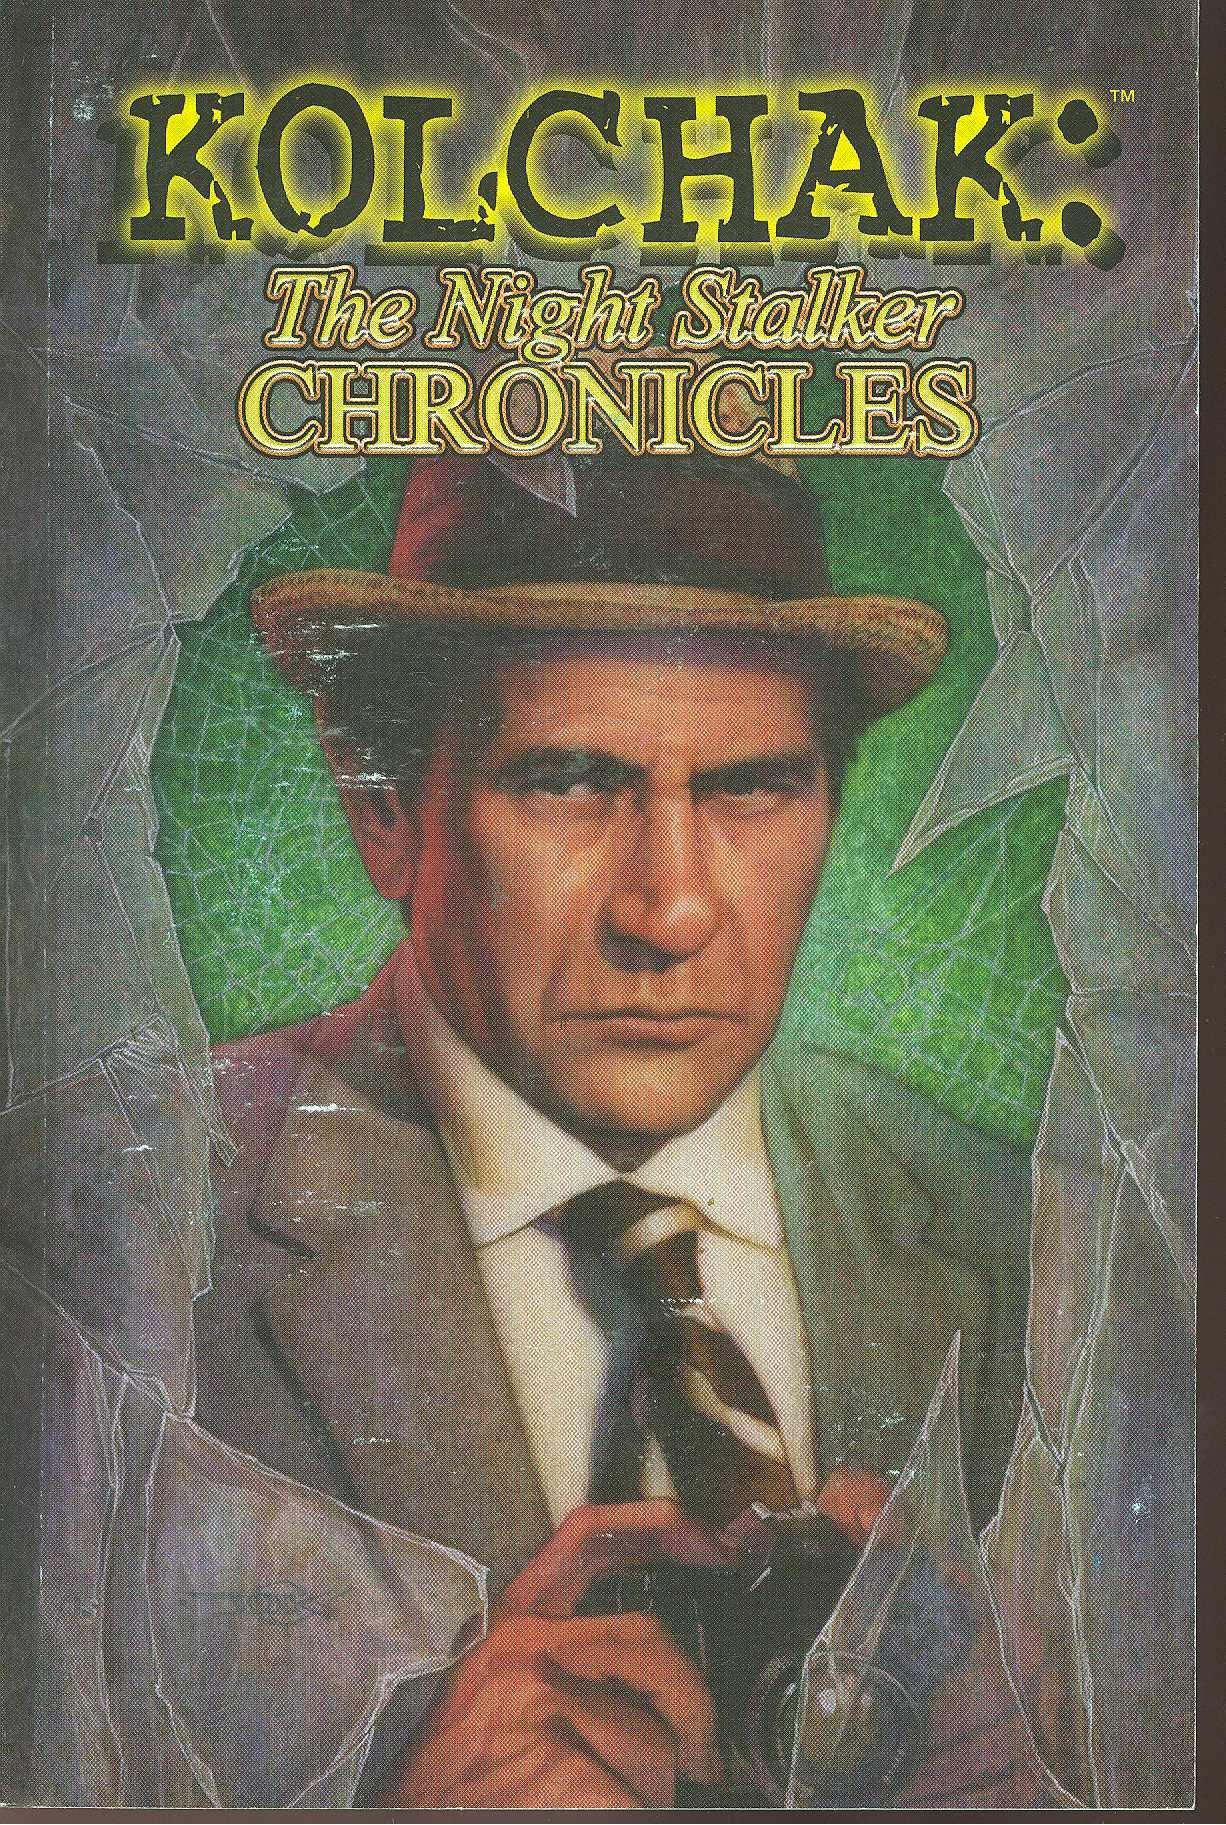 Kolchak: The Night Stalker Chronicles ebook